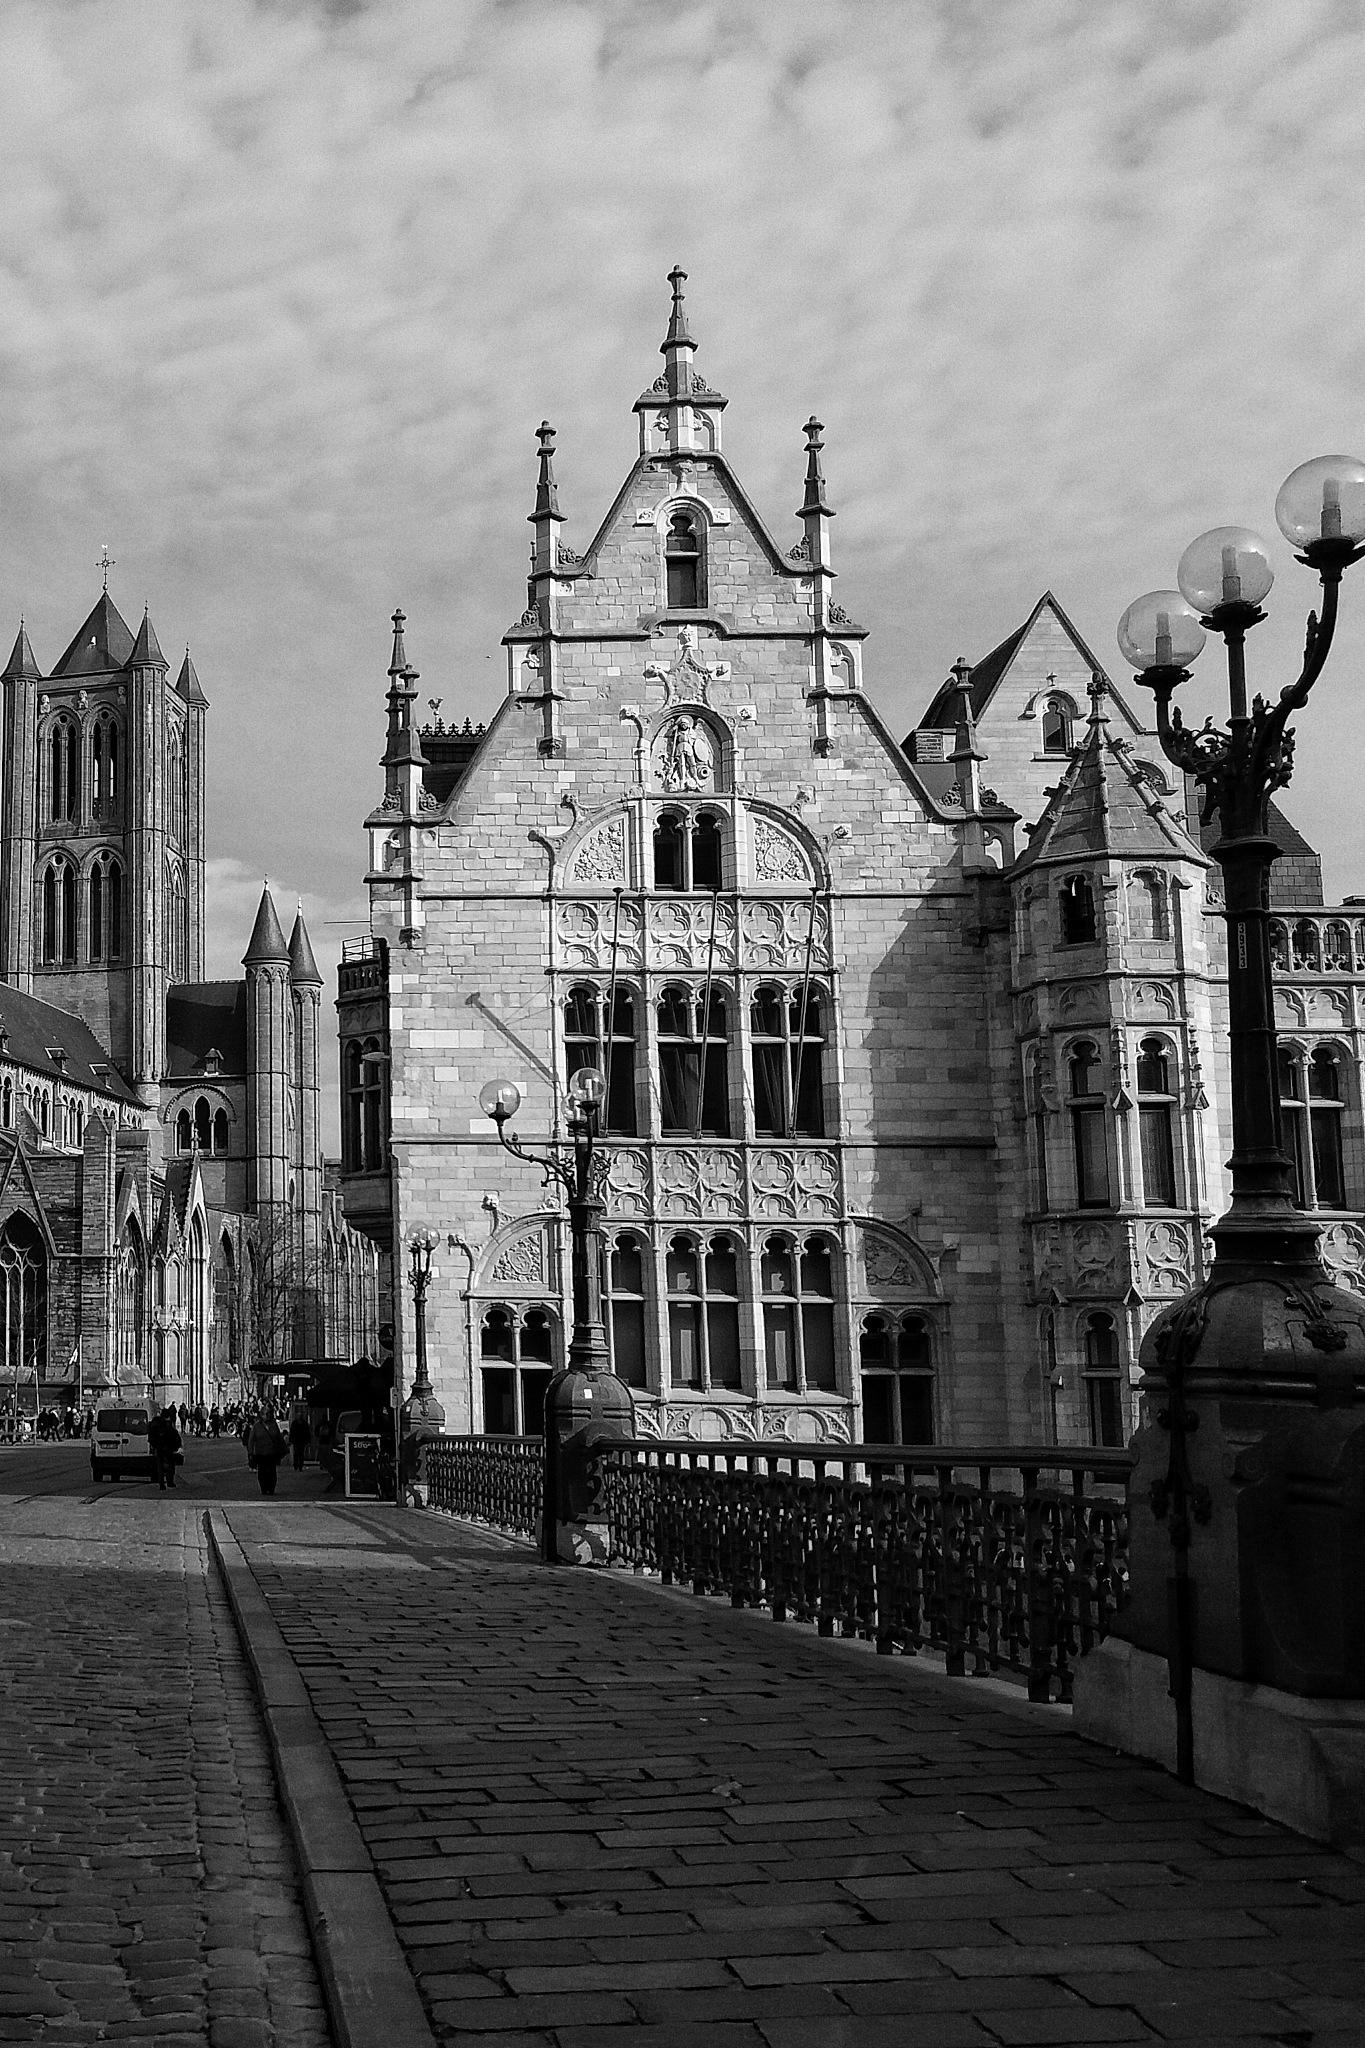 Gent-Gand-Ghent by Flammang Misch